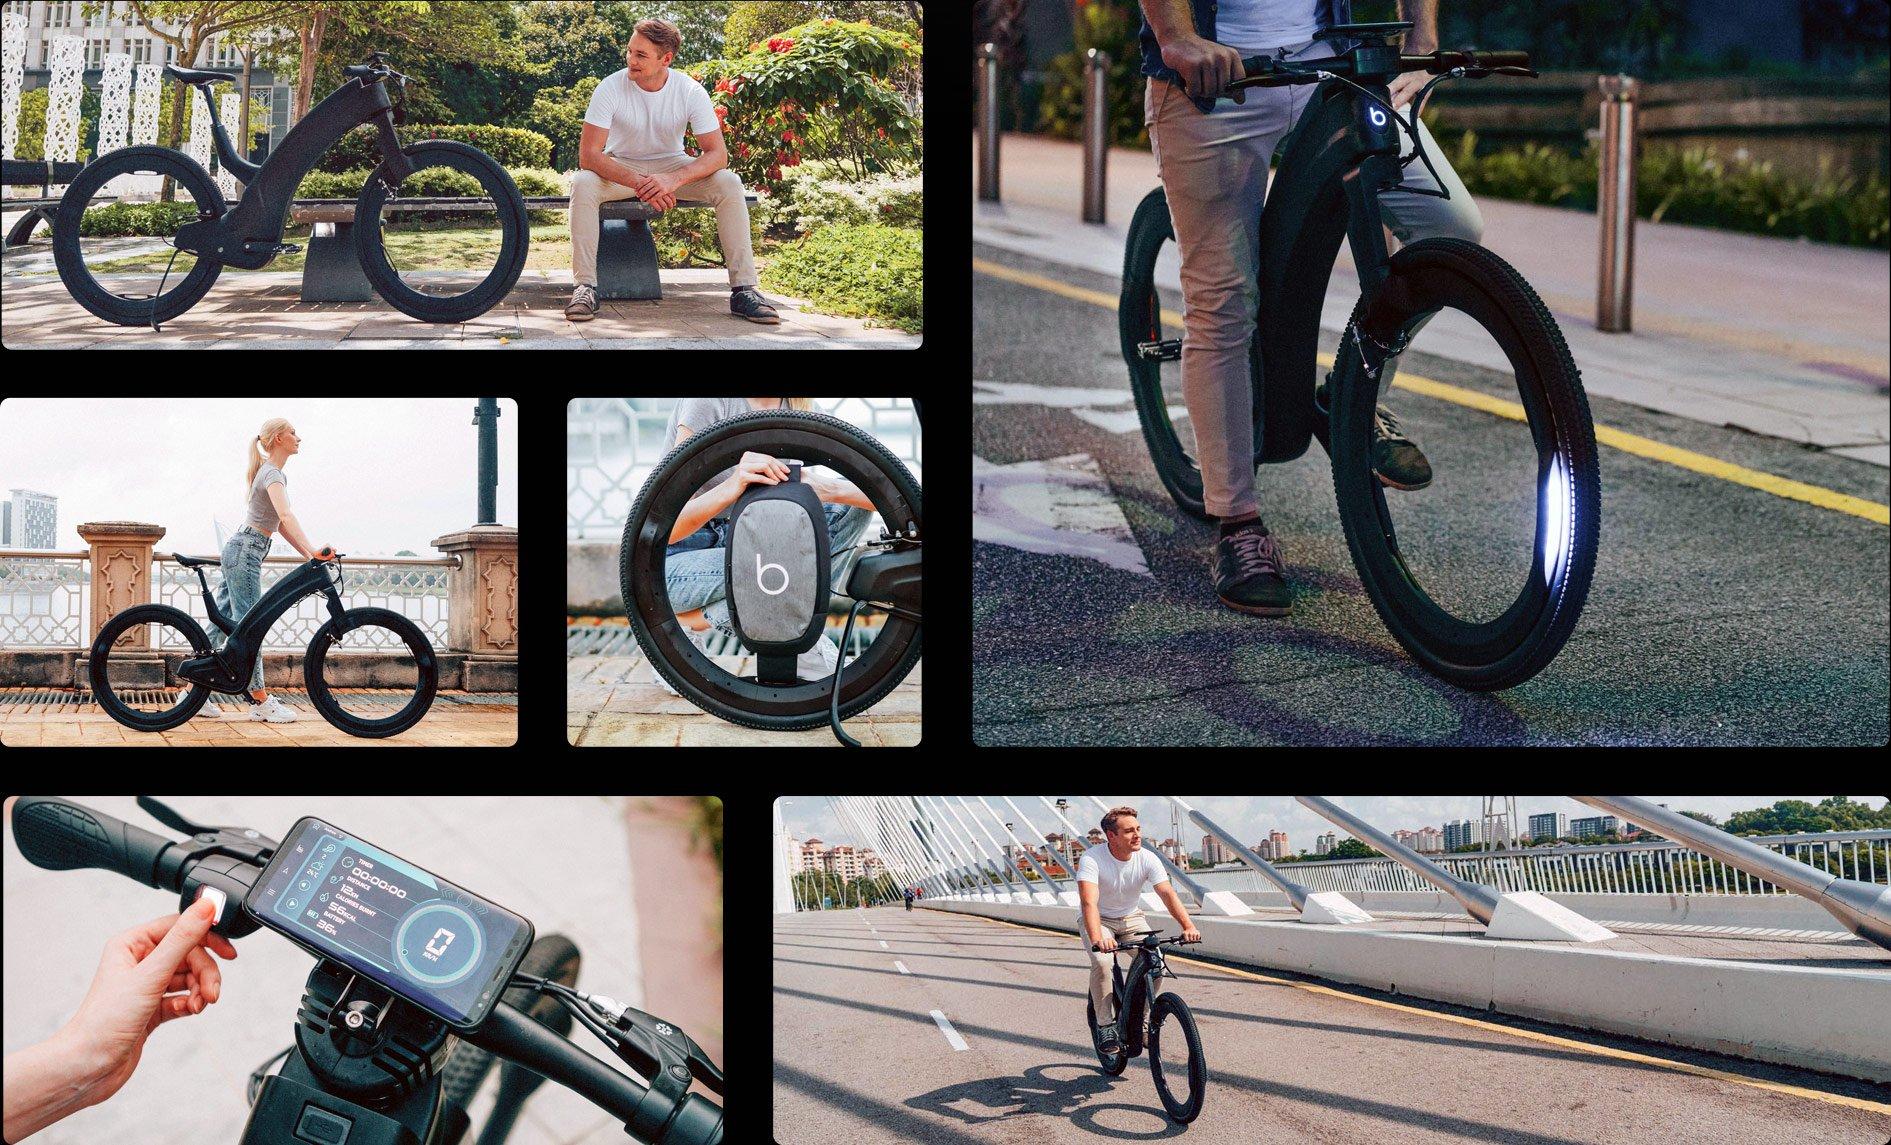 Hubless E-bike, reevo, elektrische fiets, zonder spaken, vingerscanner